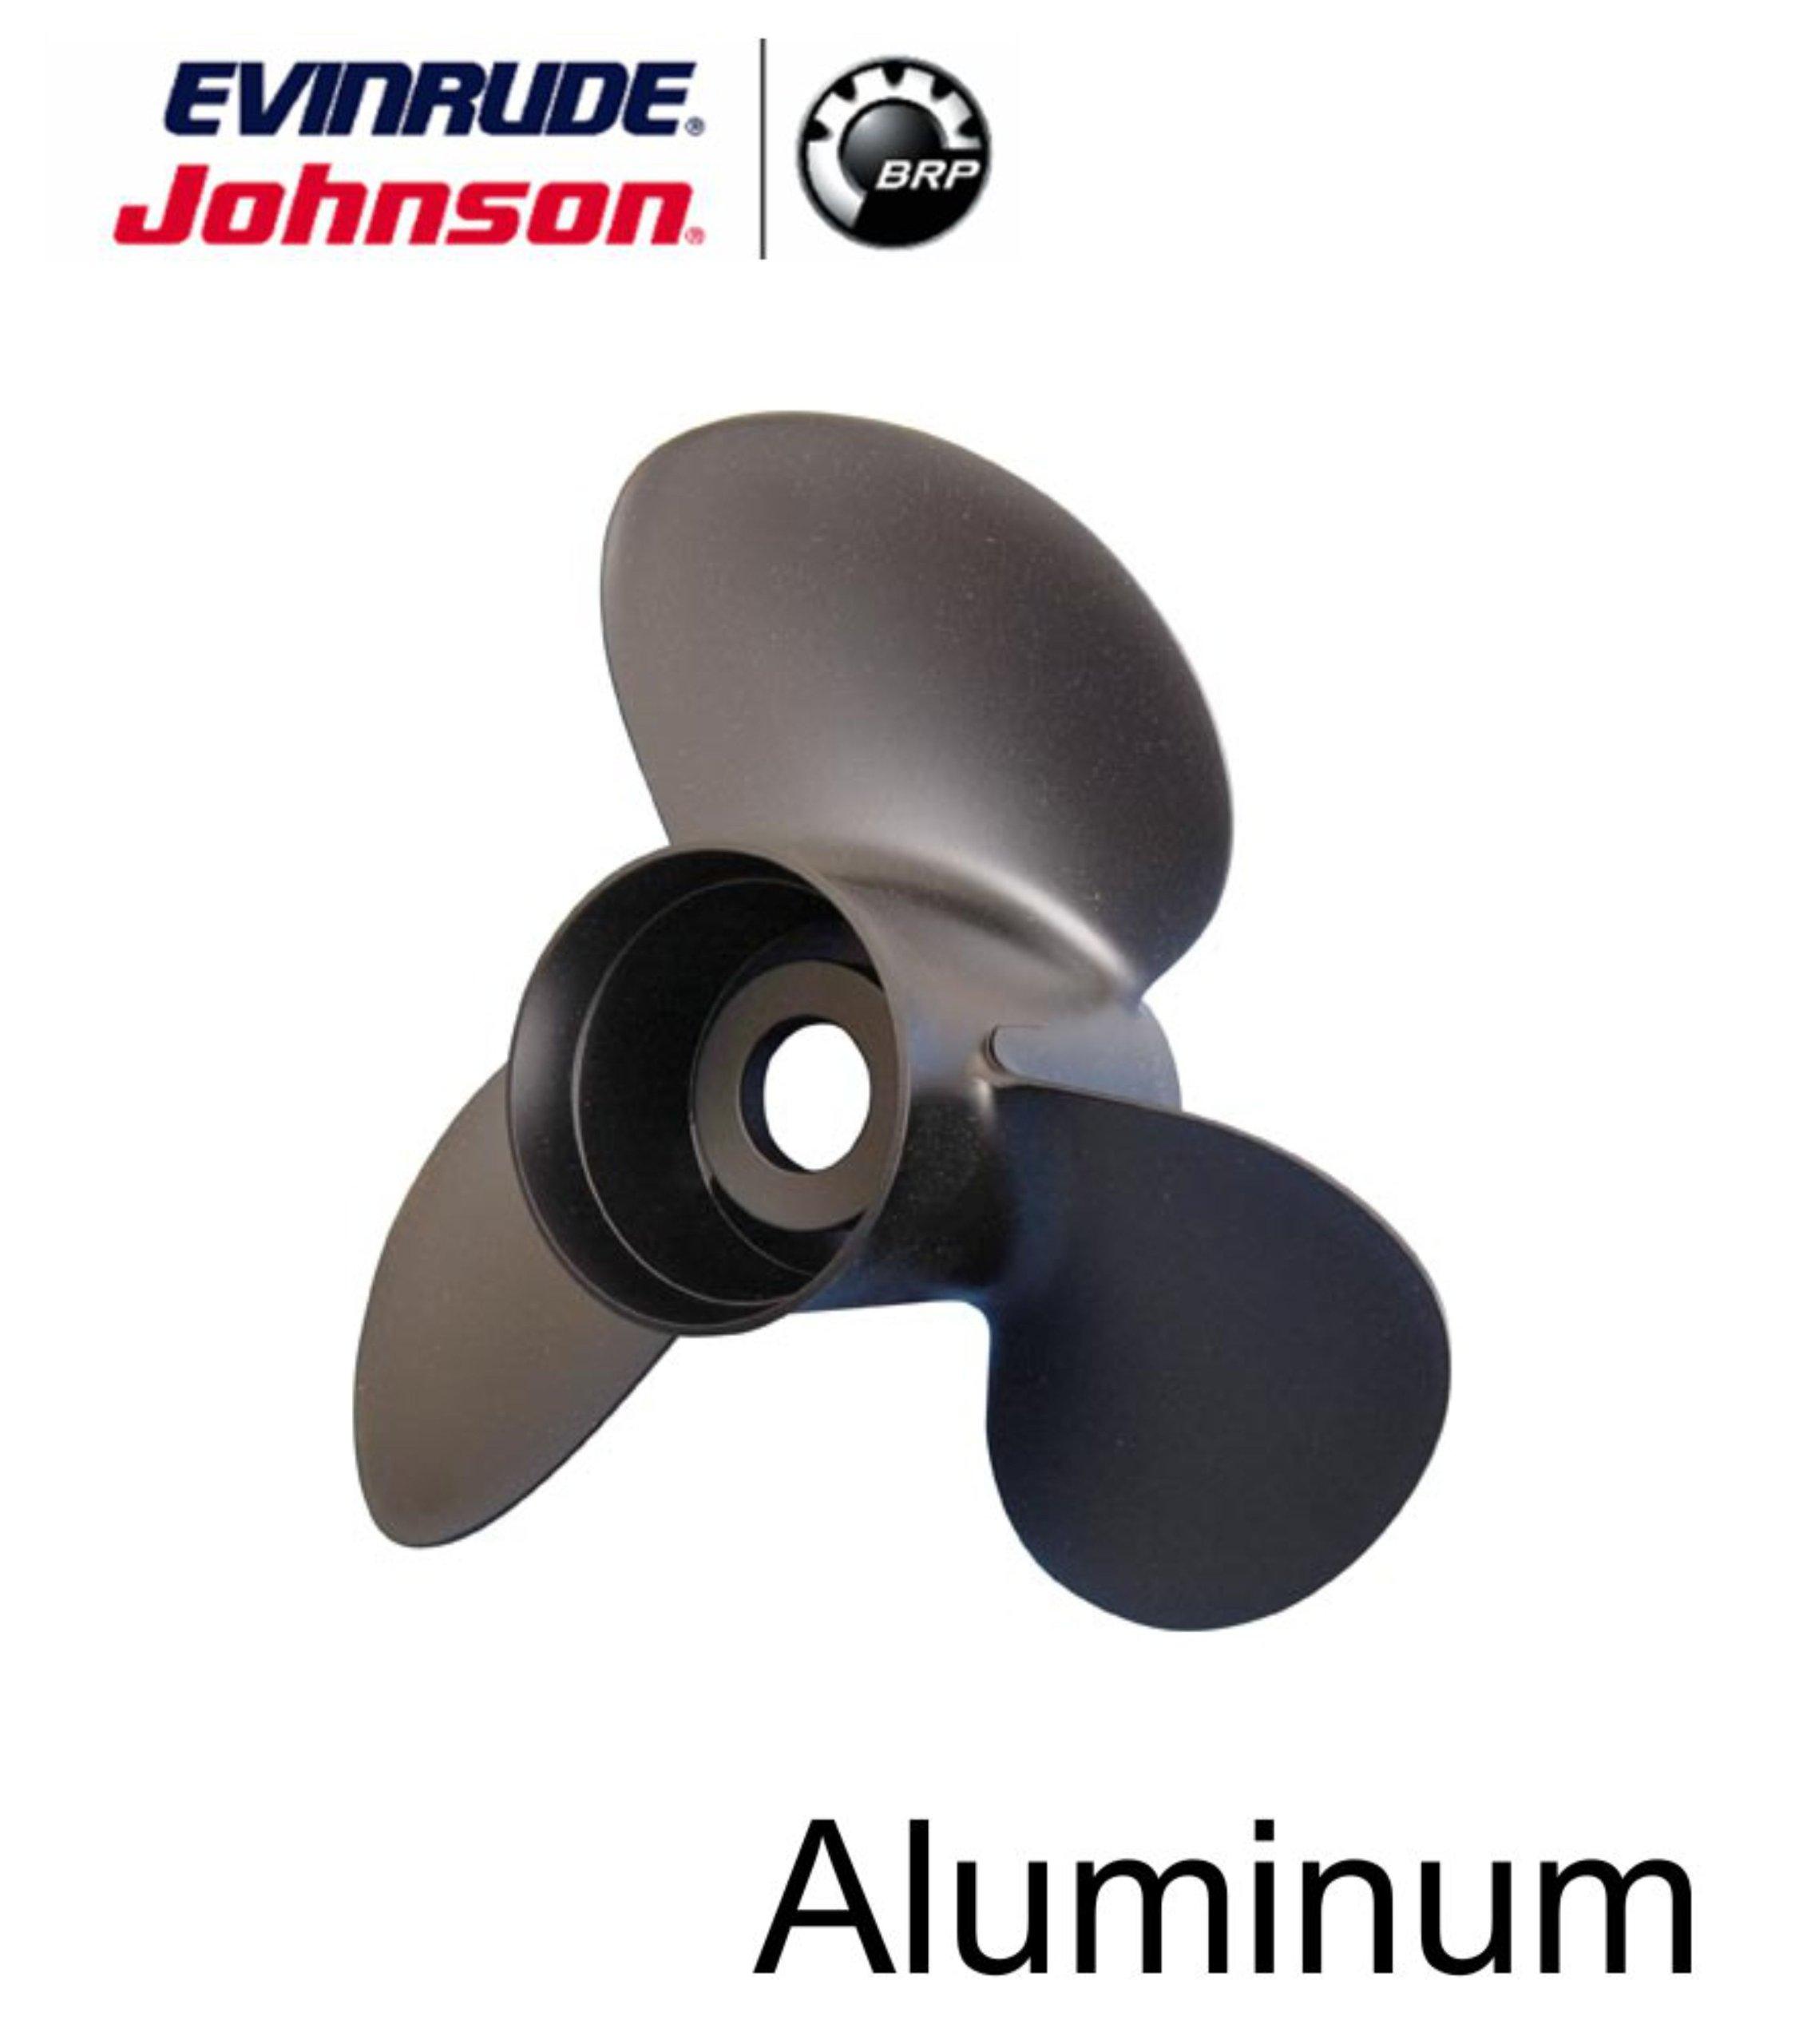 Johnson Evinrude E-Tec 3 Blade Aluminum V-4 Prop Propeller 13 1/4'' x 17'' 765183 by BRP